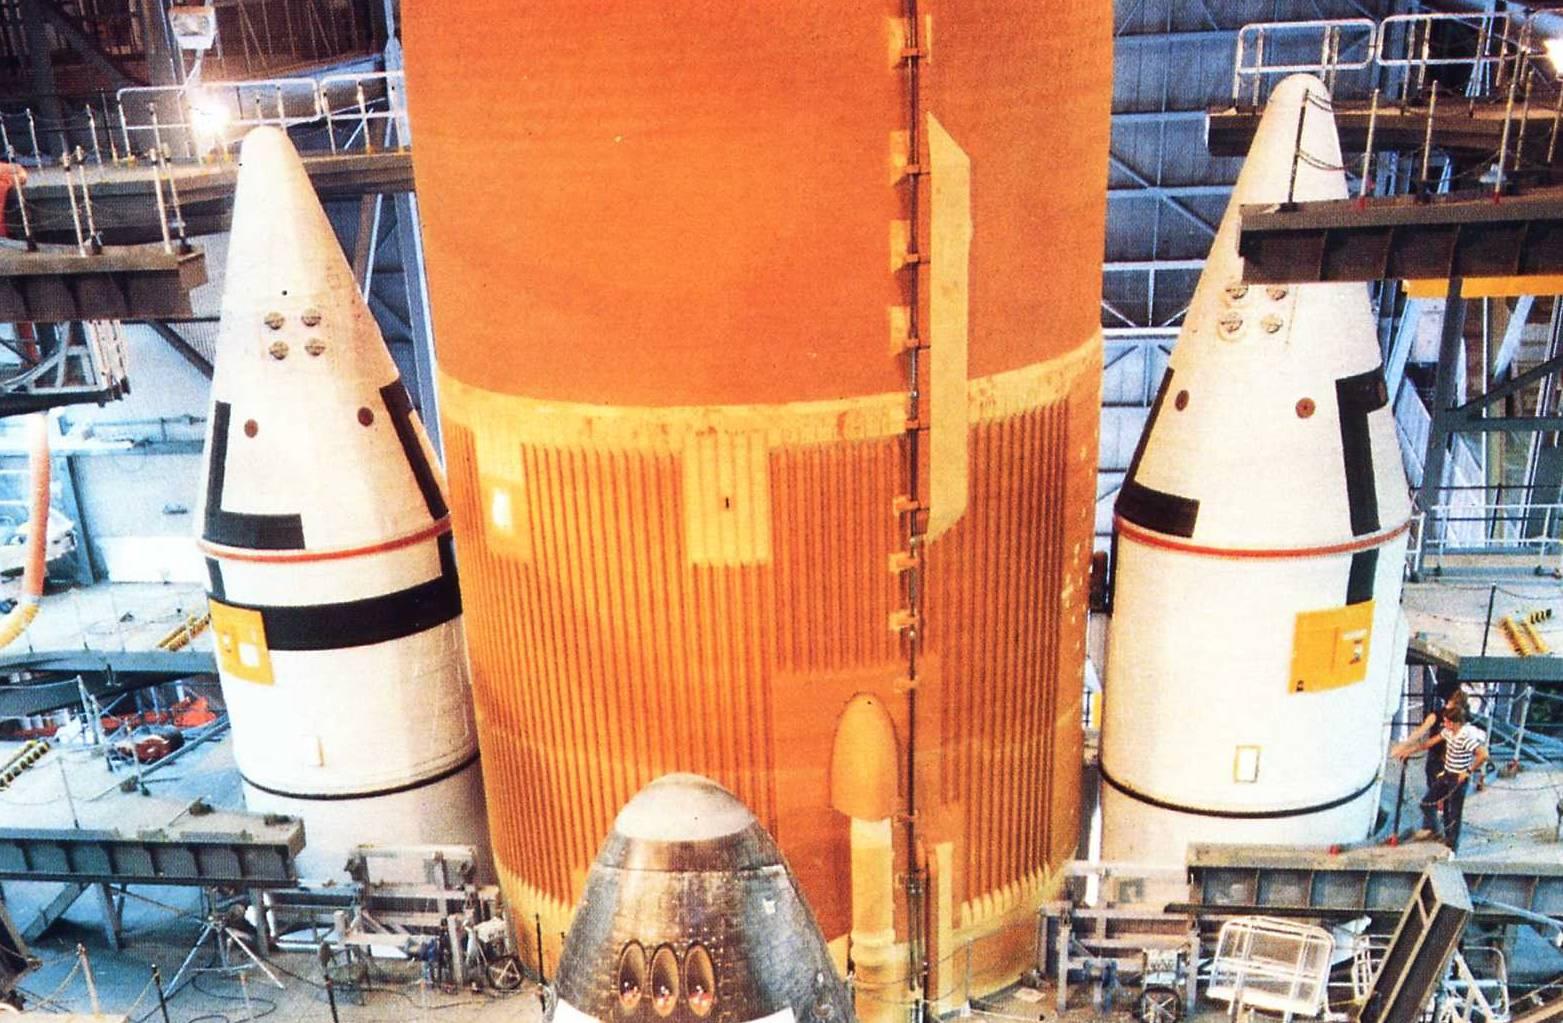 space shuttle srb - photo #18